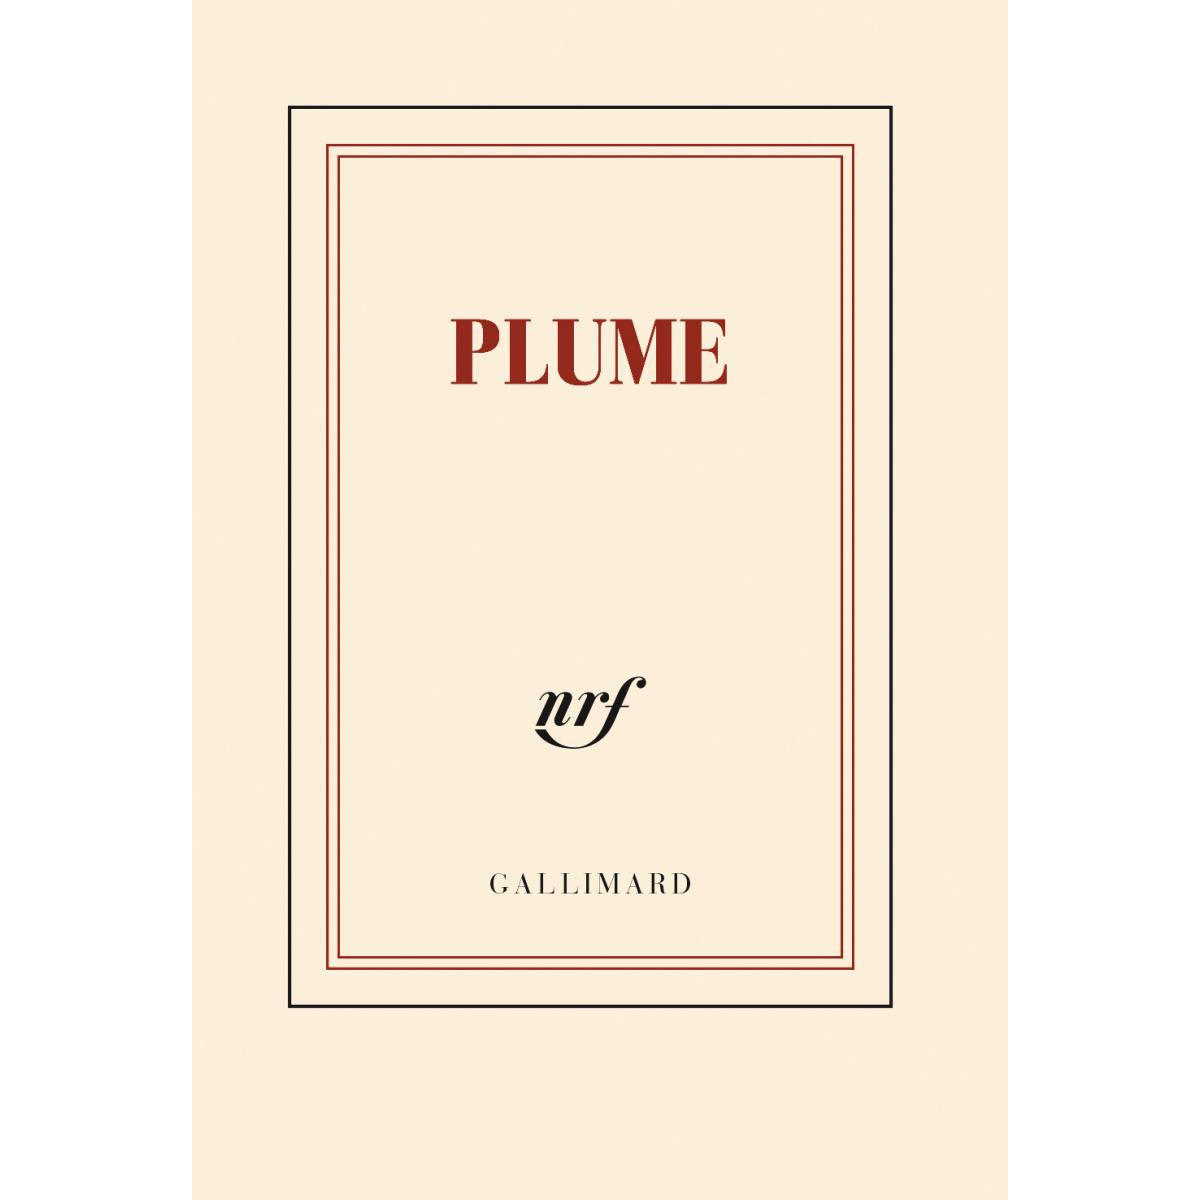 plume carnet poche de papeterie galerie gallimard. Black Bedroom Furniture Sets. Home Design Ideas